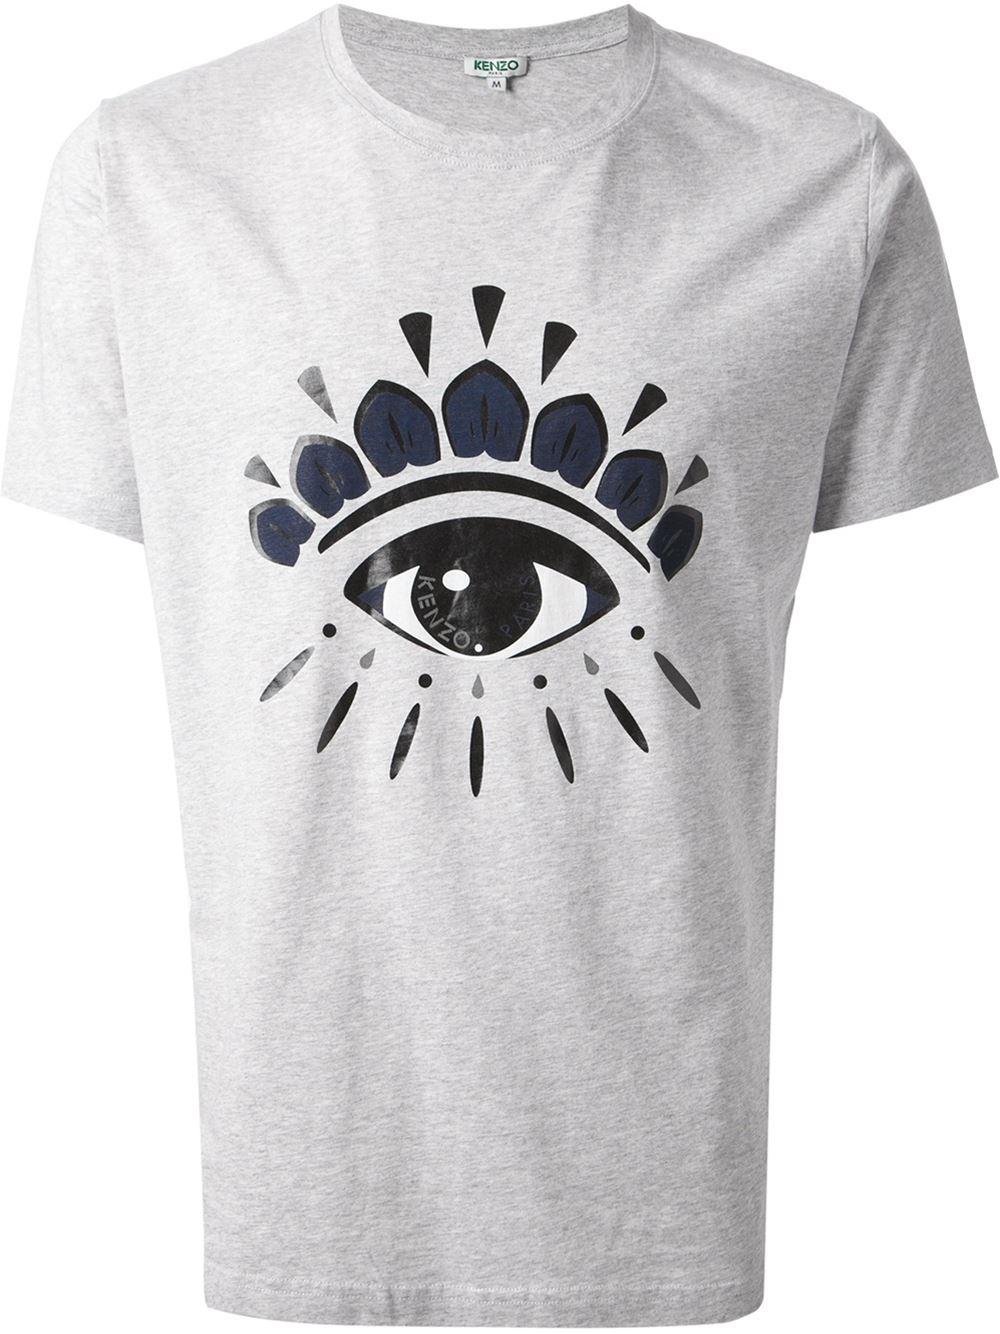 ada8631e KENZO Eye Print T-shirt in Gray for Men - Lyst